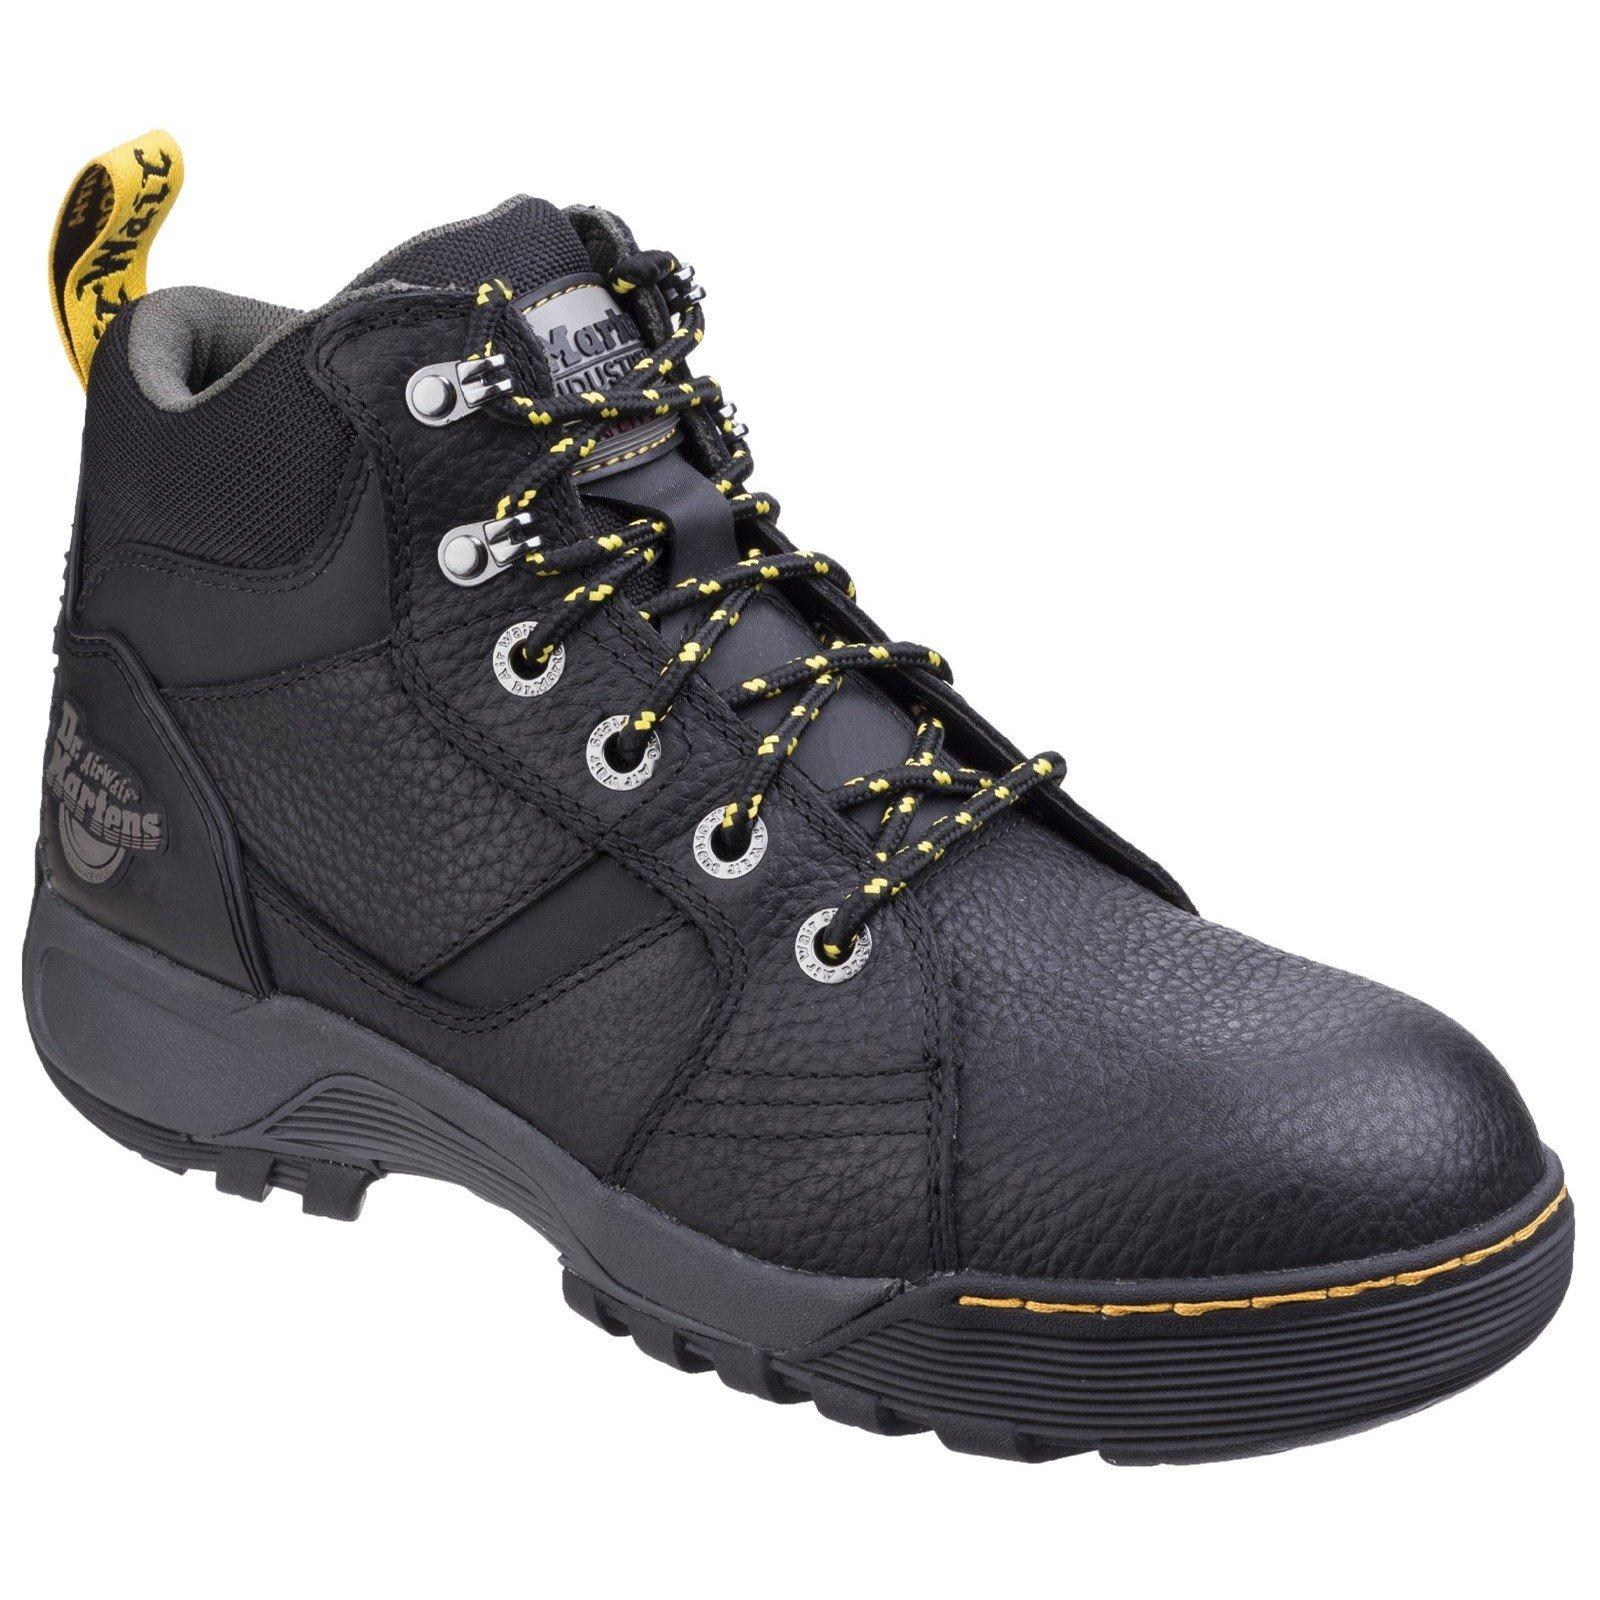 Dr Martens Men's Grapple Safety Boot Various Colours 26023 - Black 11